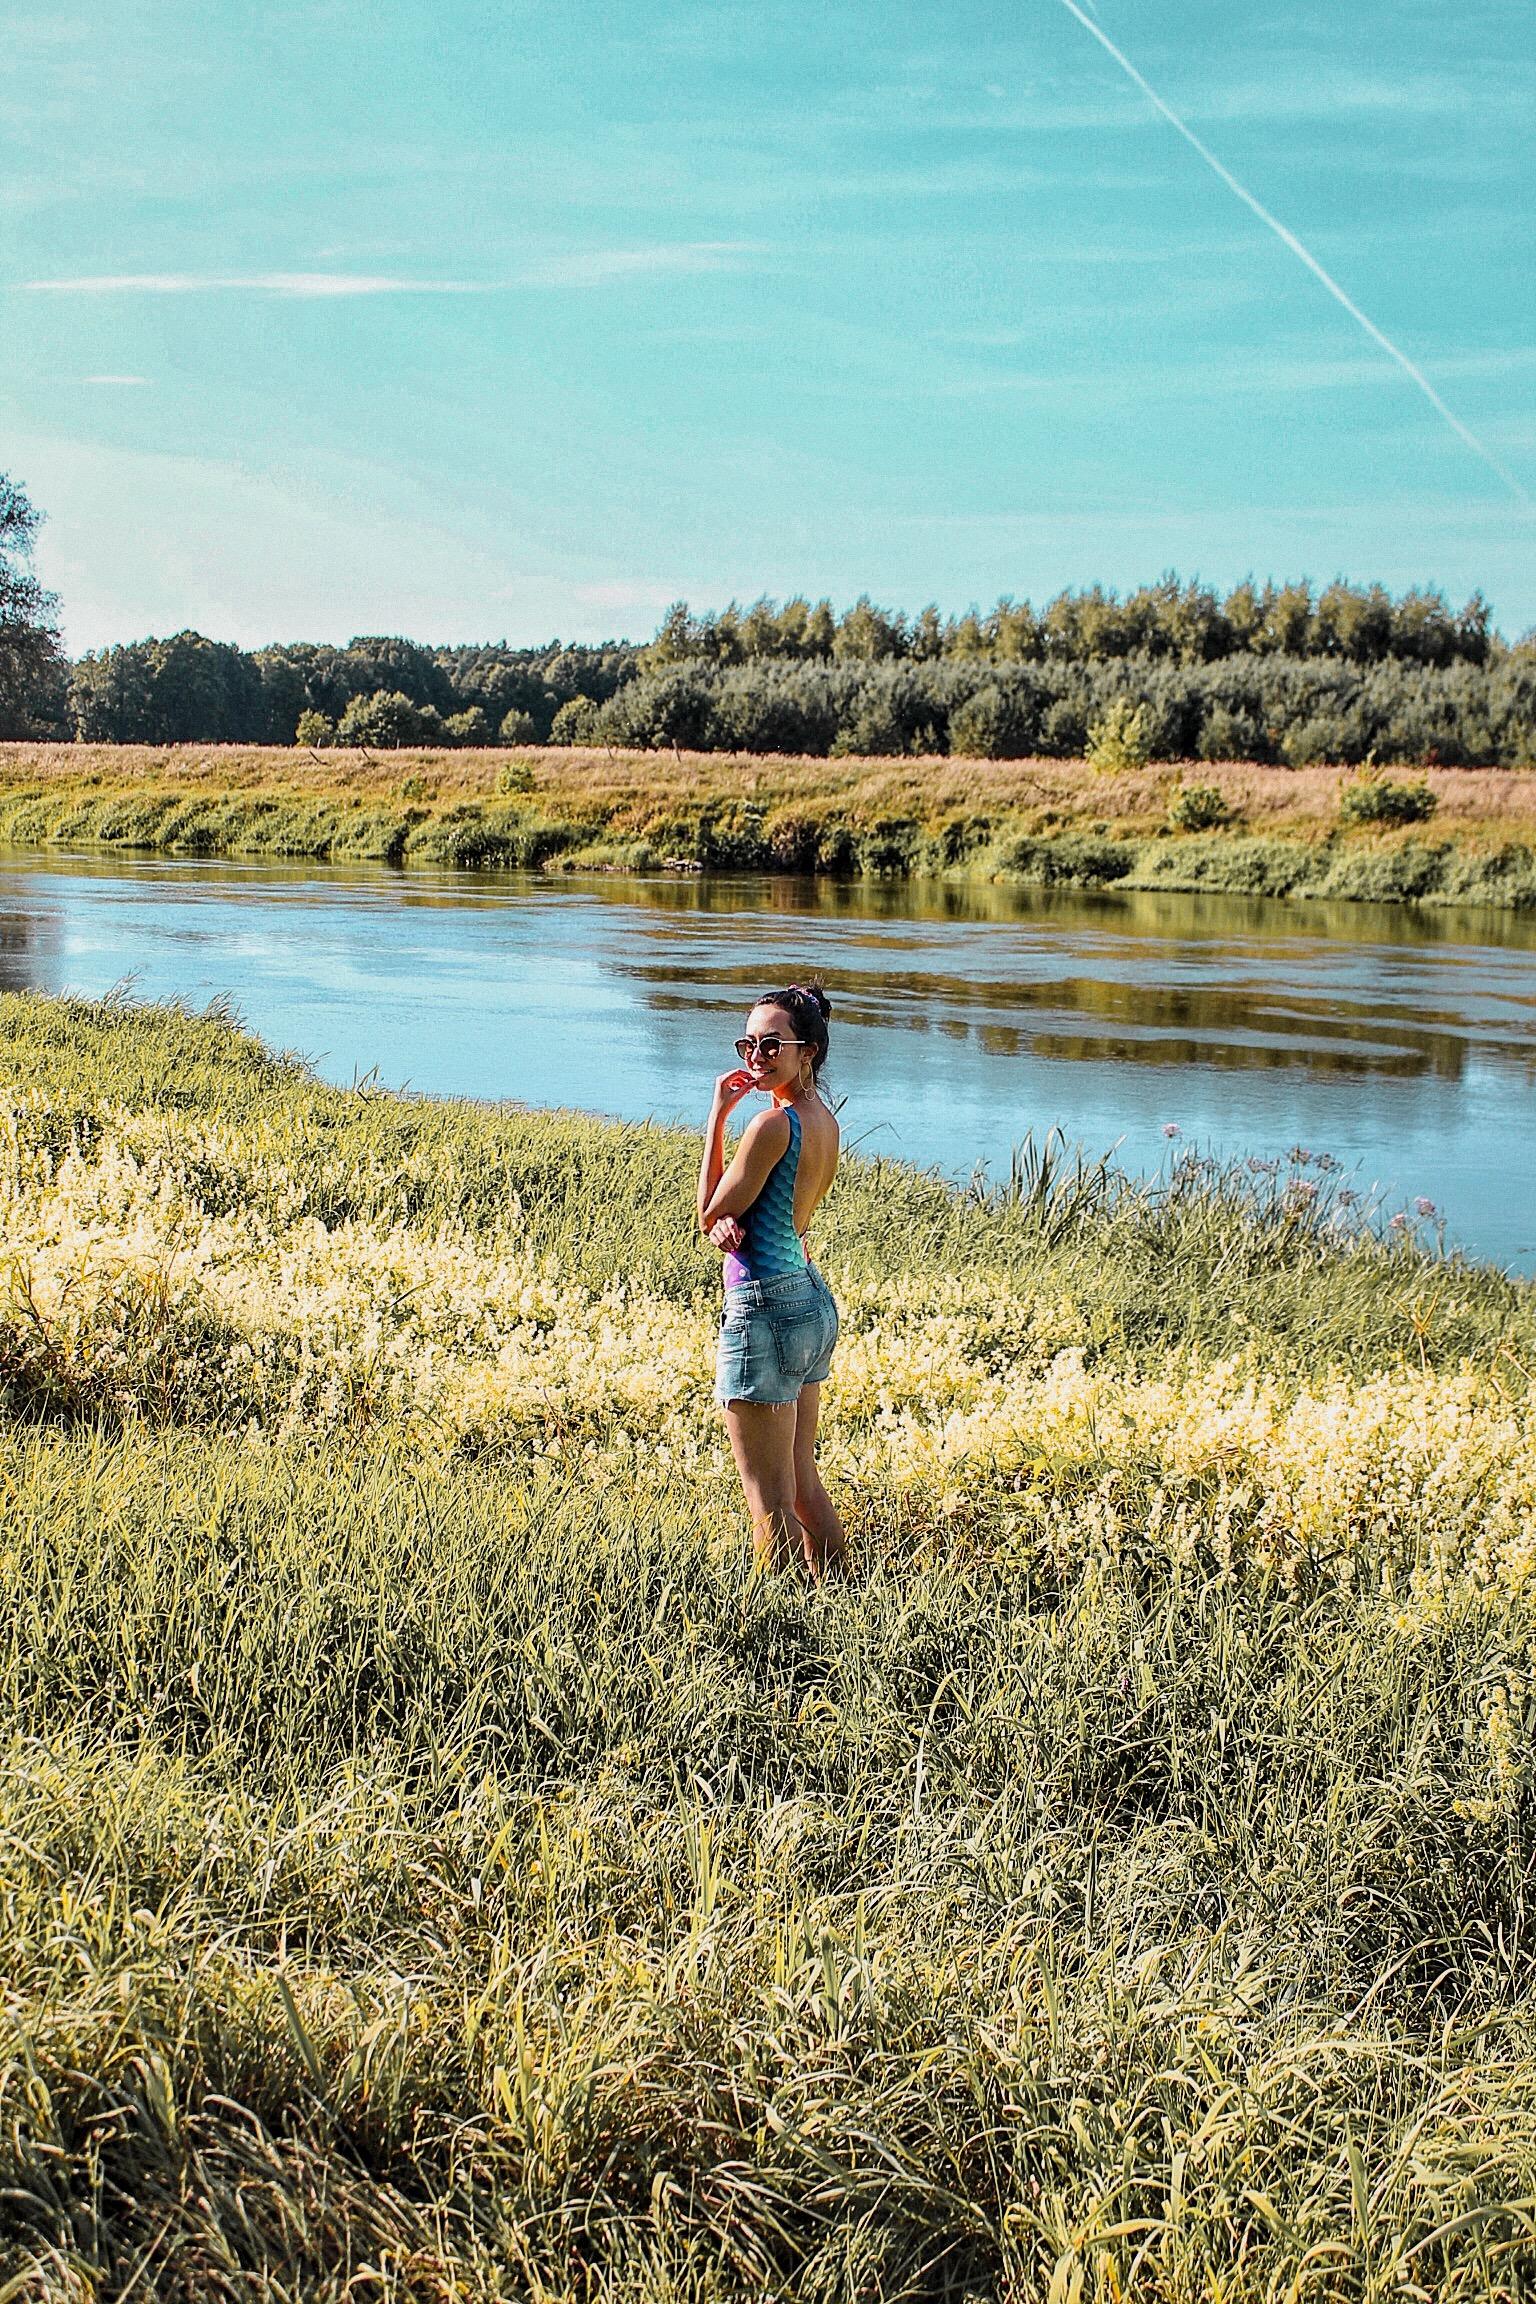 lifesthayle-wielkopolska-warta-river-thayanna-sena.JPG